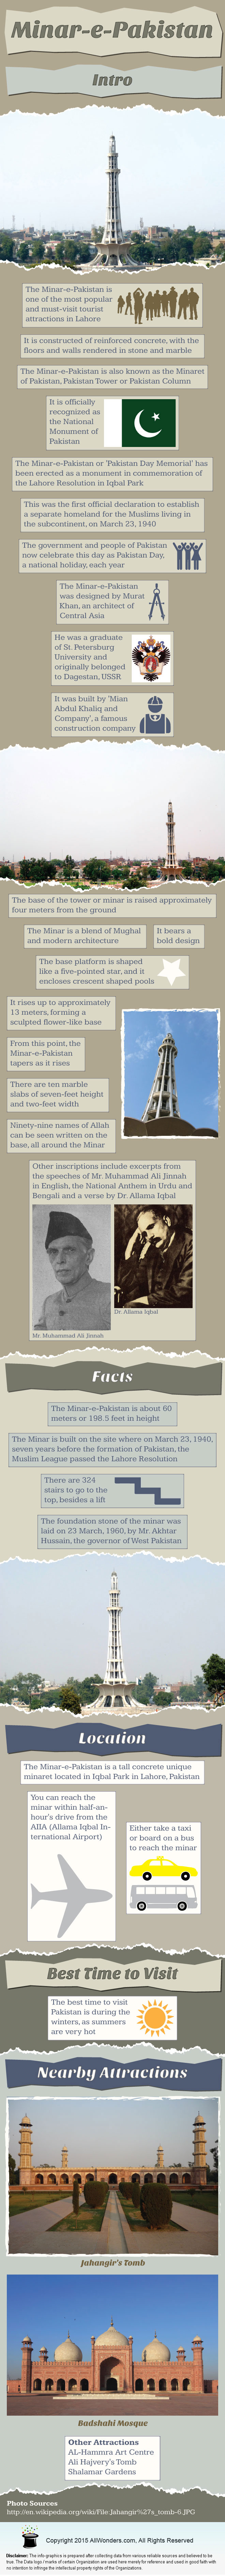 Minar-e-Pakistan Infogrphic